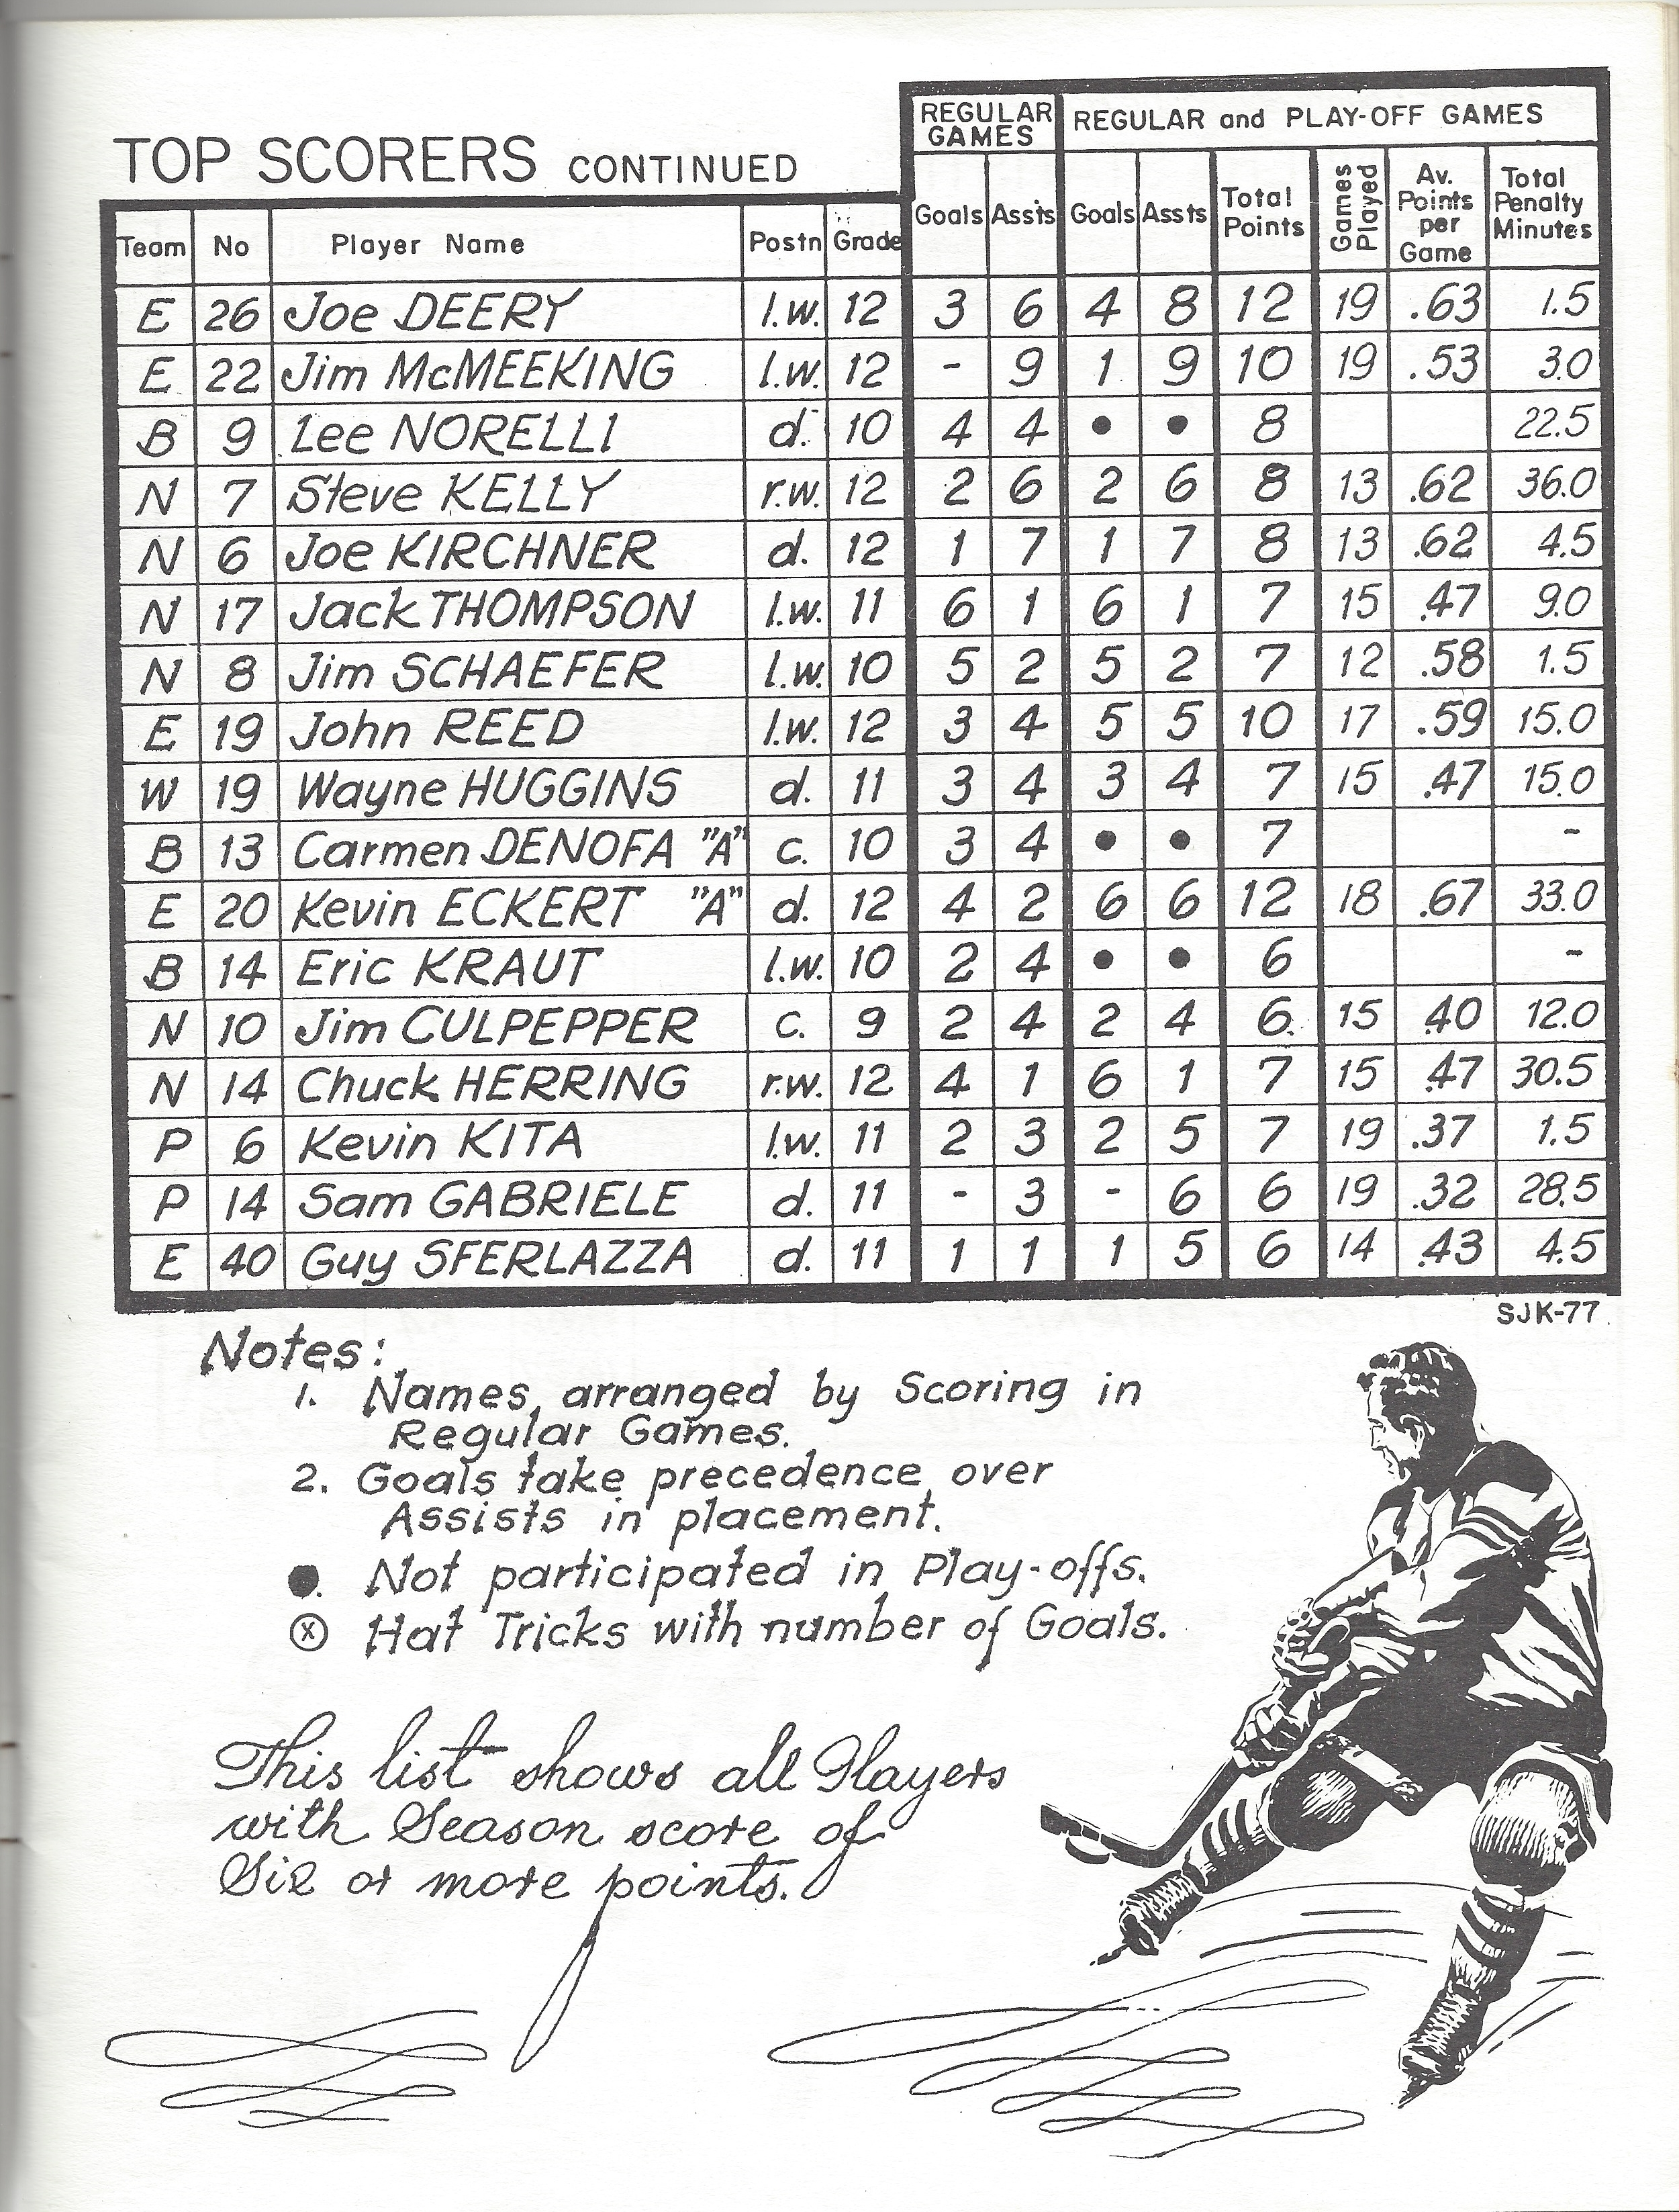 1976 LBCSHL Top Scorers